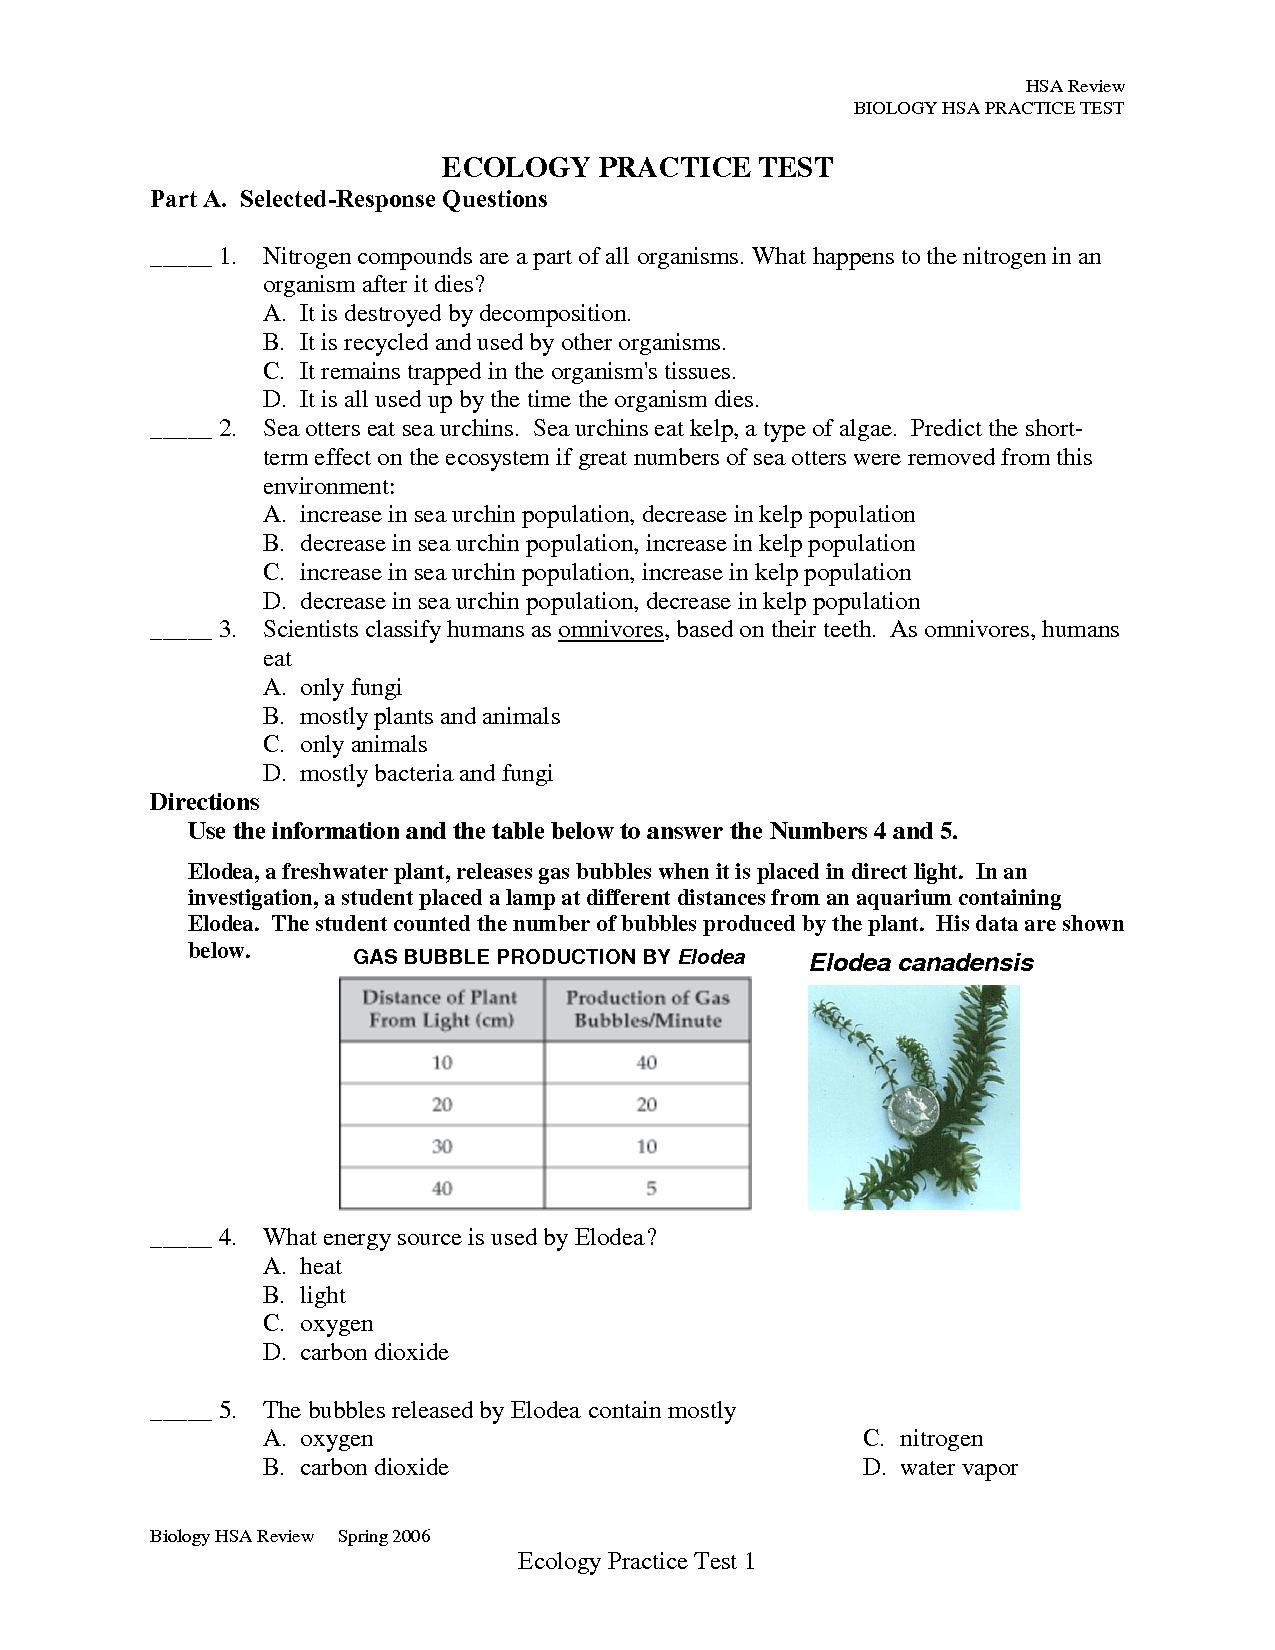 Ecology Practice Test Ap Biology Biological Science